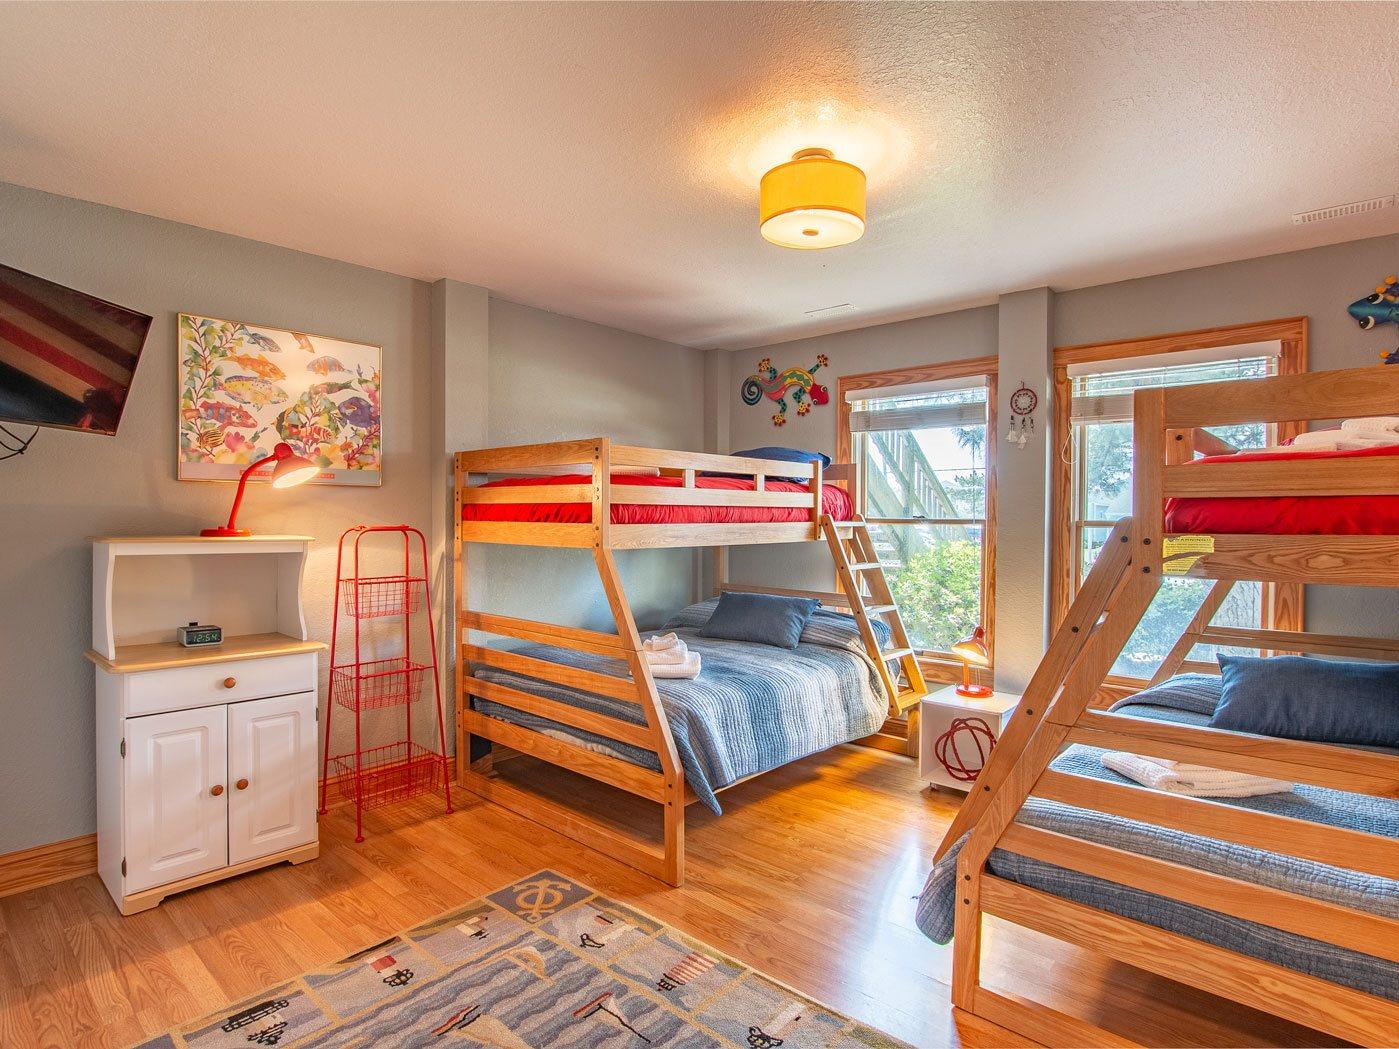 5414-crawford-cottage-22